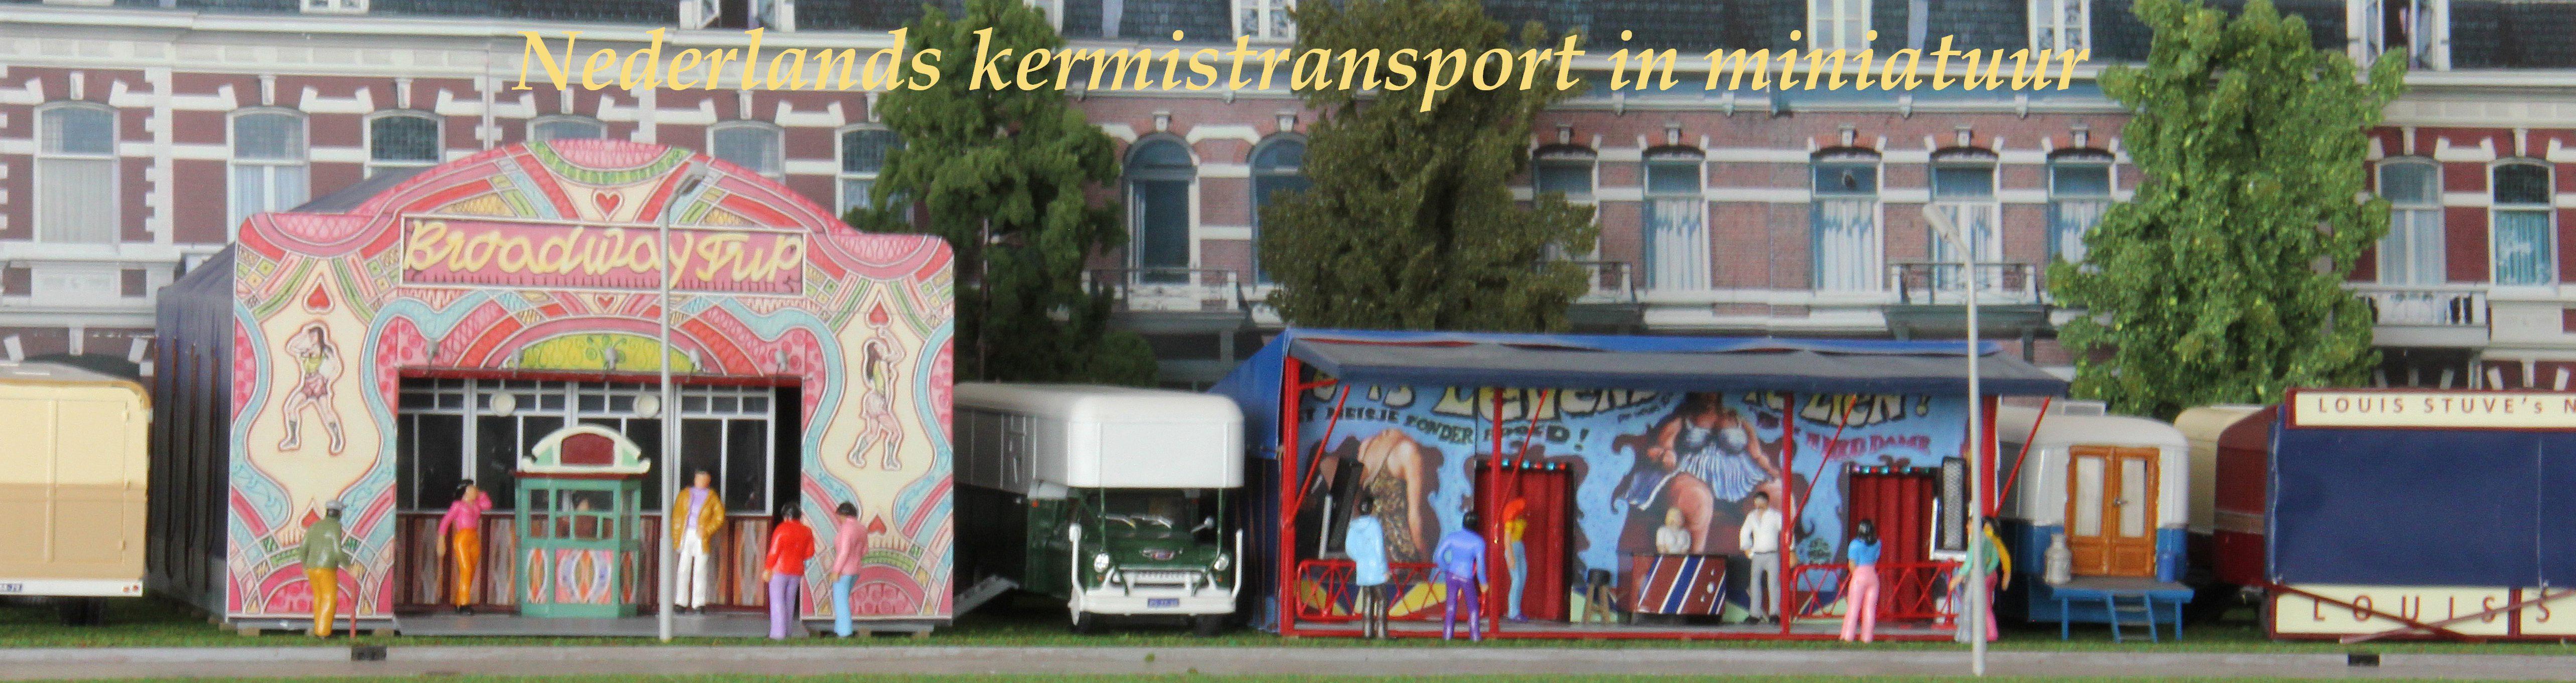 Nederlands kermistransport in miniatuur